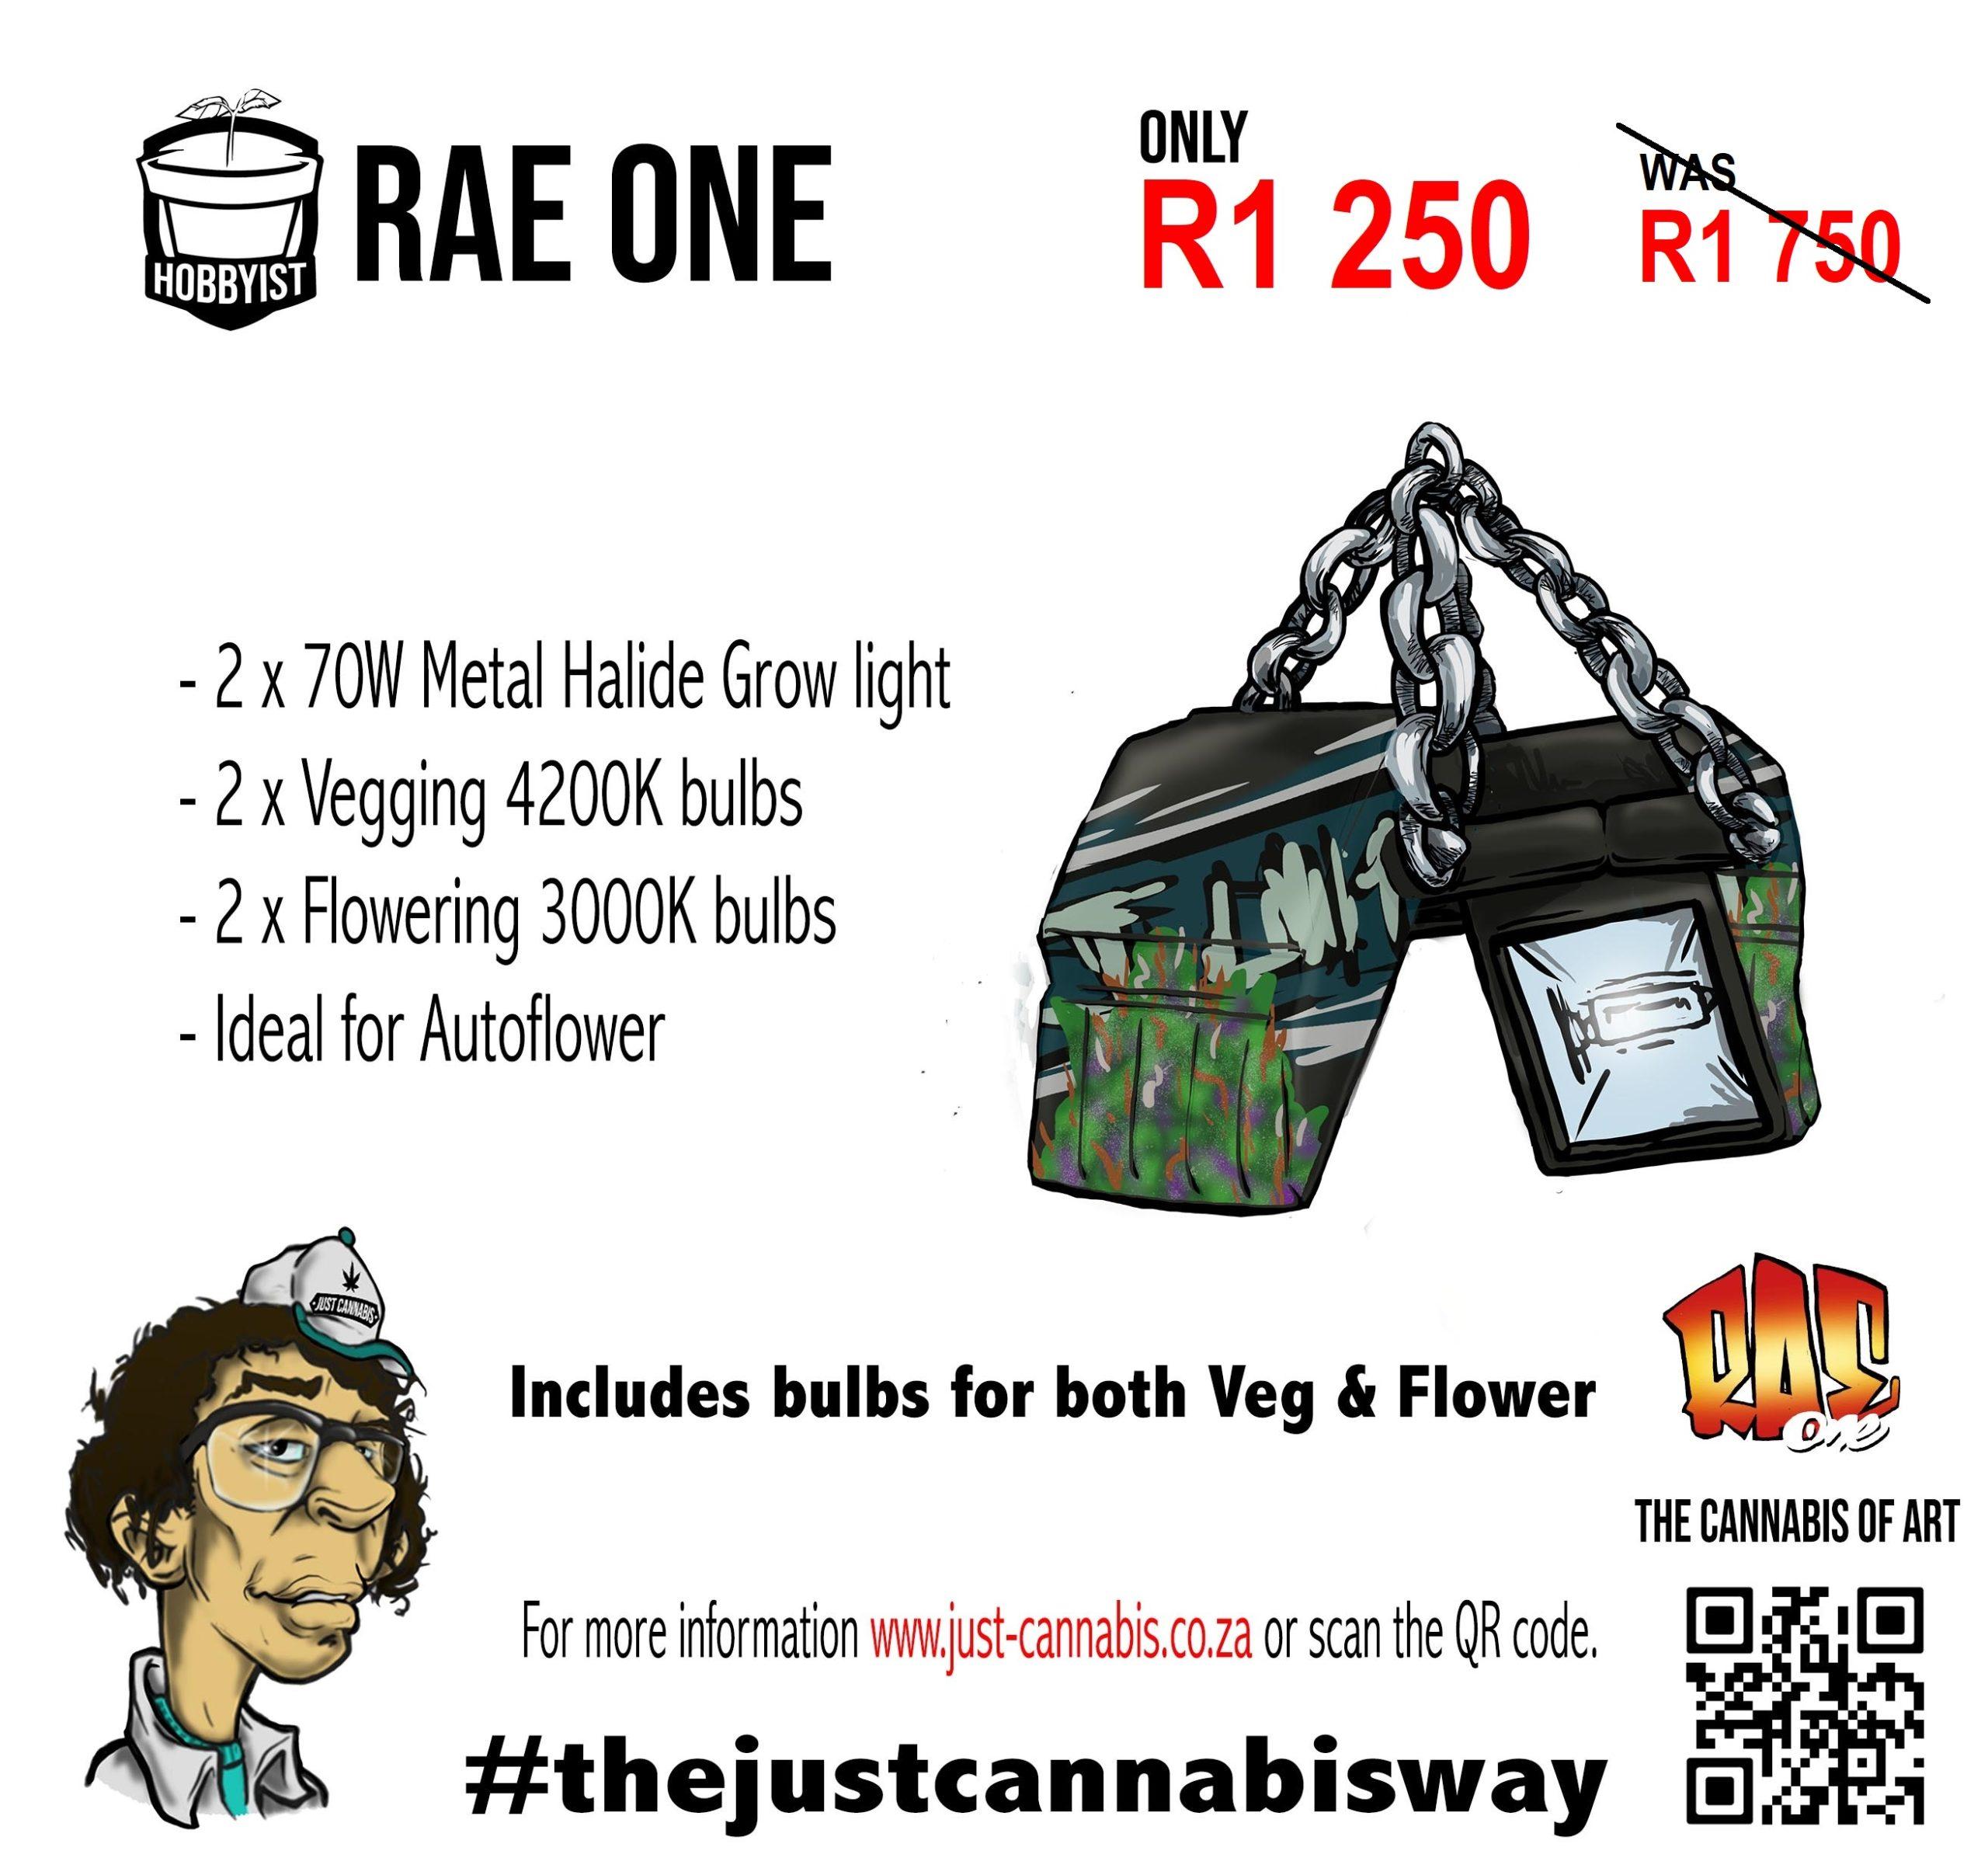 Rae One Grow Light